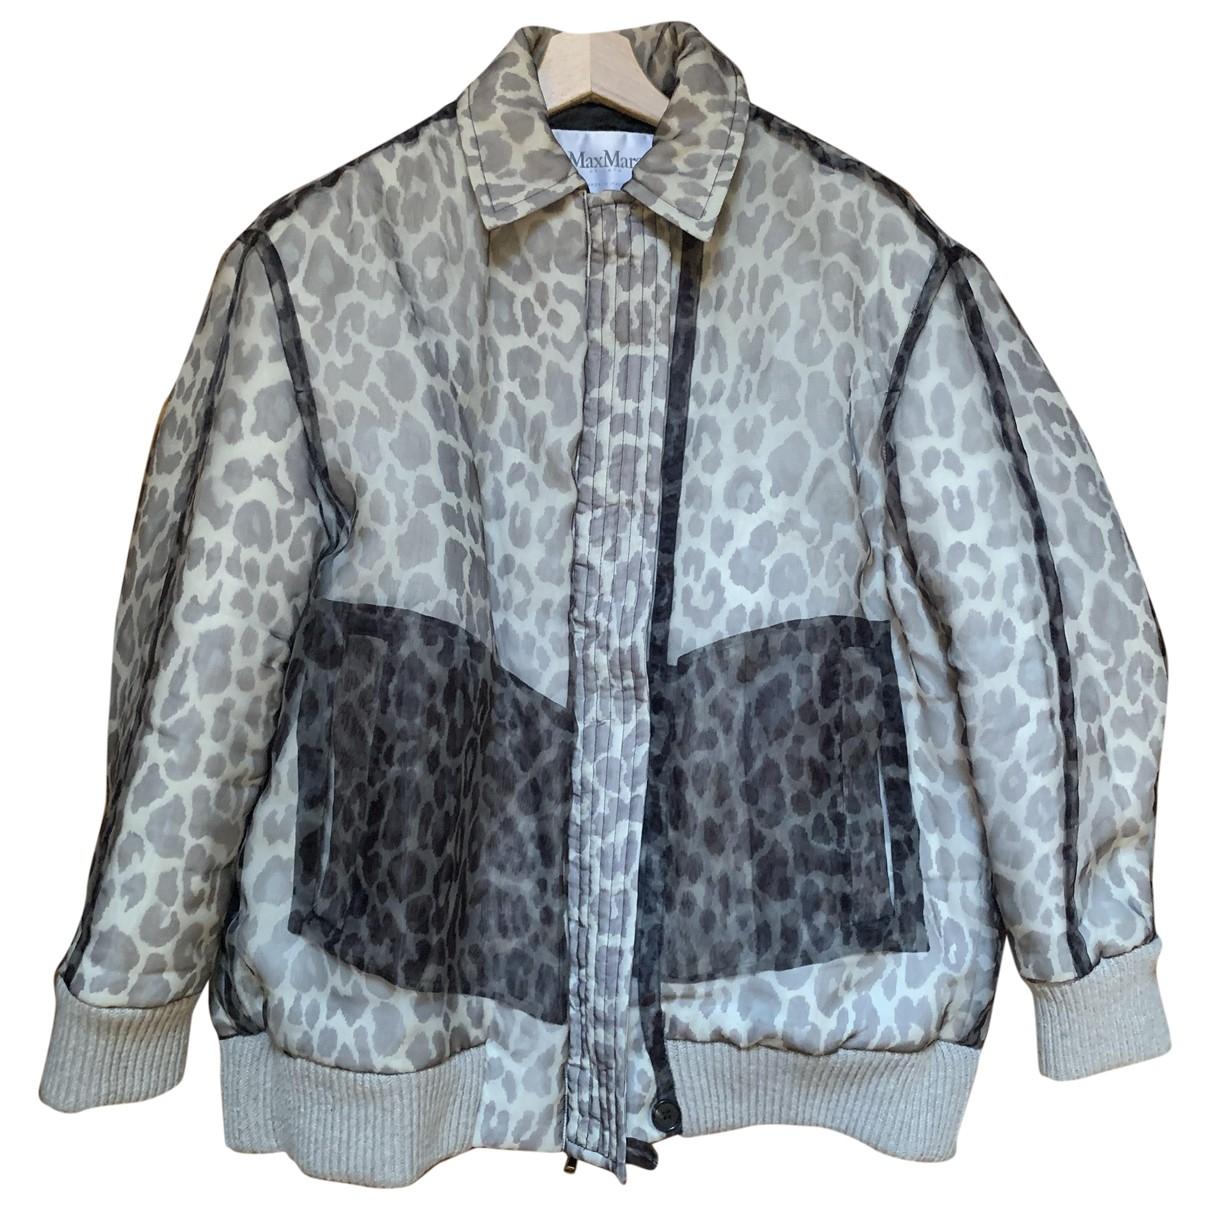 Max Mara \N Jacke in  Grau Polyester